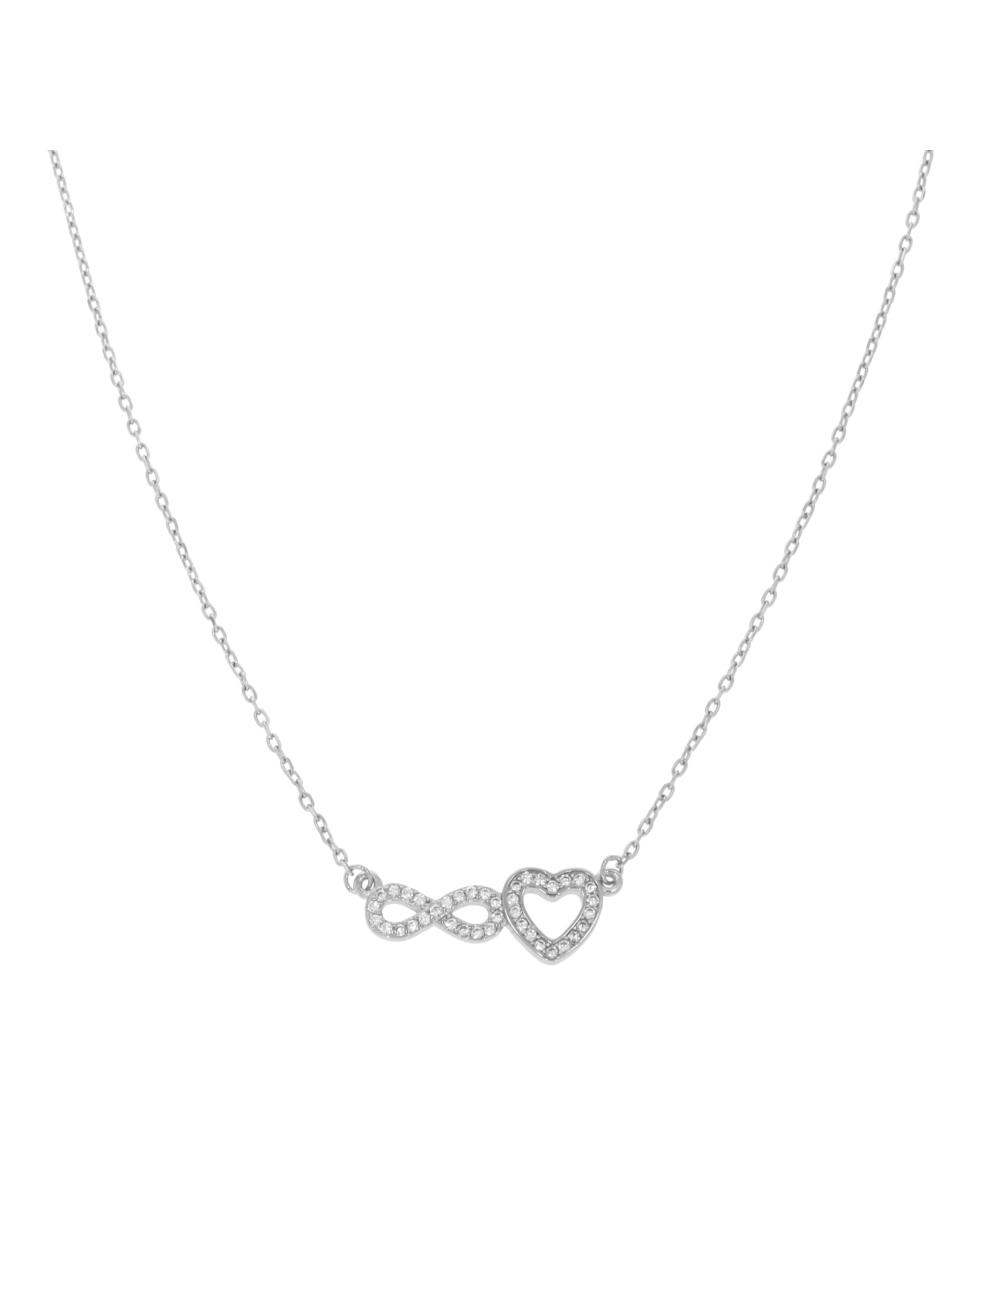 10012318 Naszyjnik srebrny pr.925 z cyrkoniami